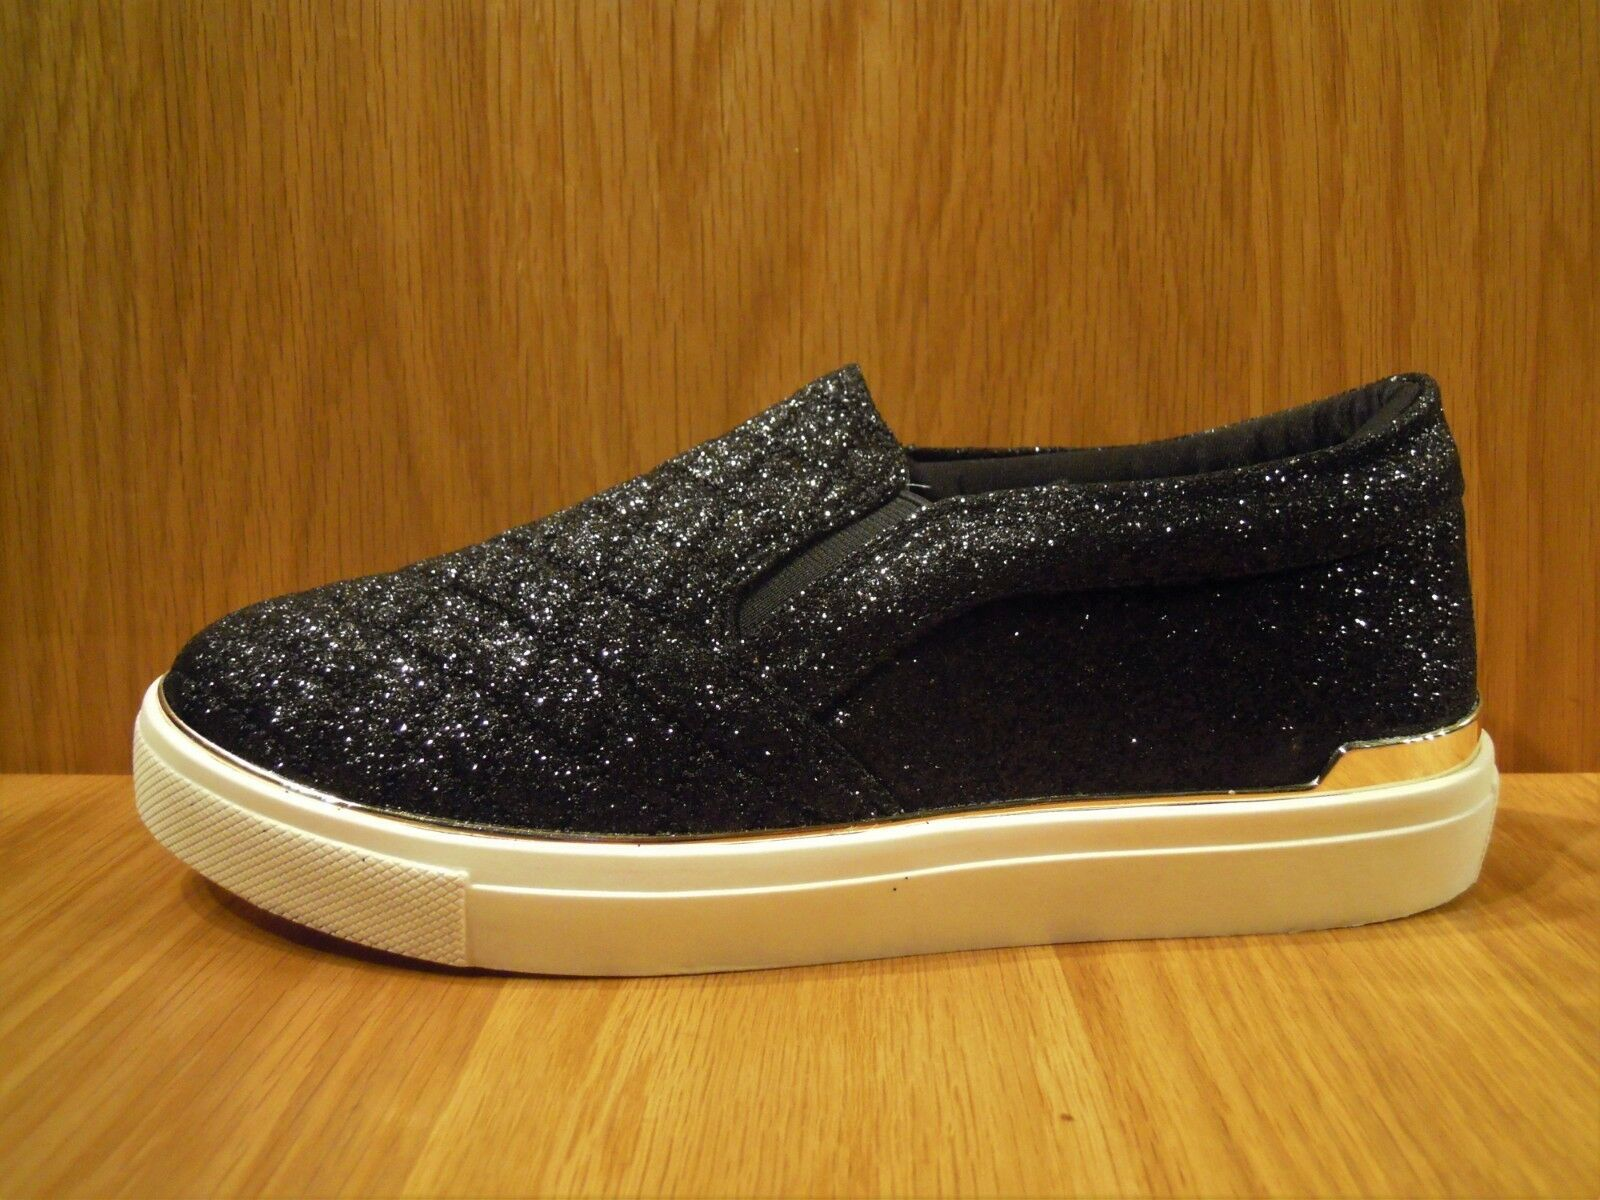 Carvela Ladies shoes Size 5 Black Pumps Flat Glitter Quilted Trainer Kurt Geiger